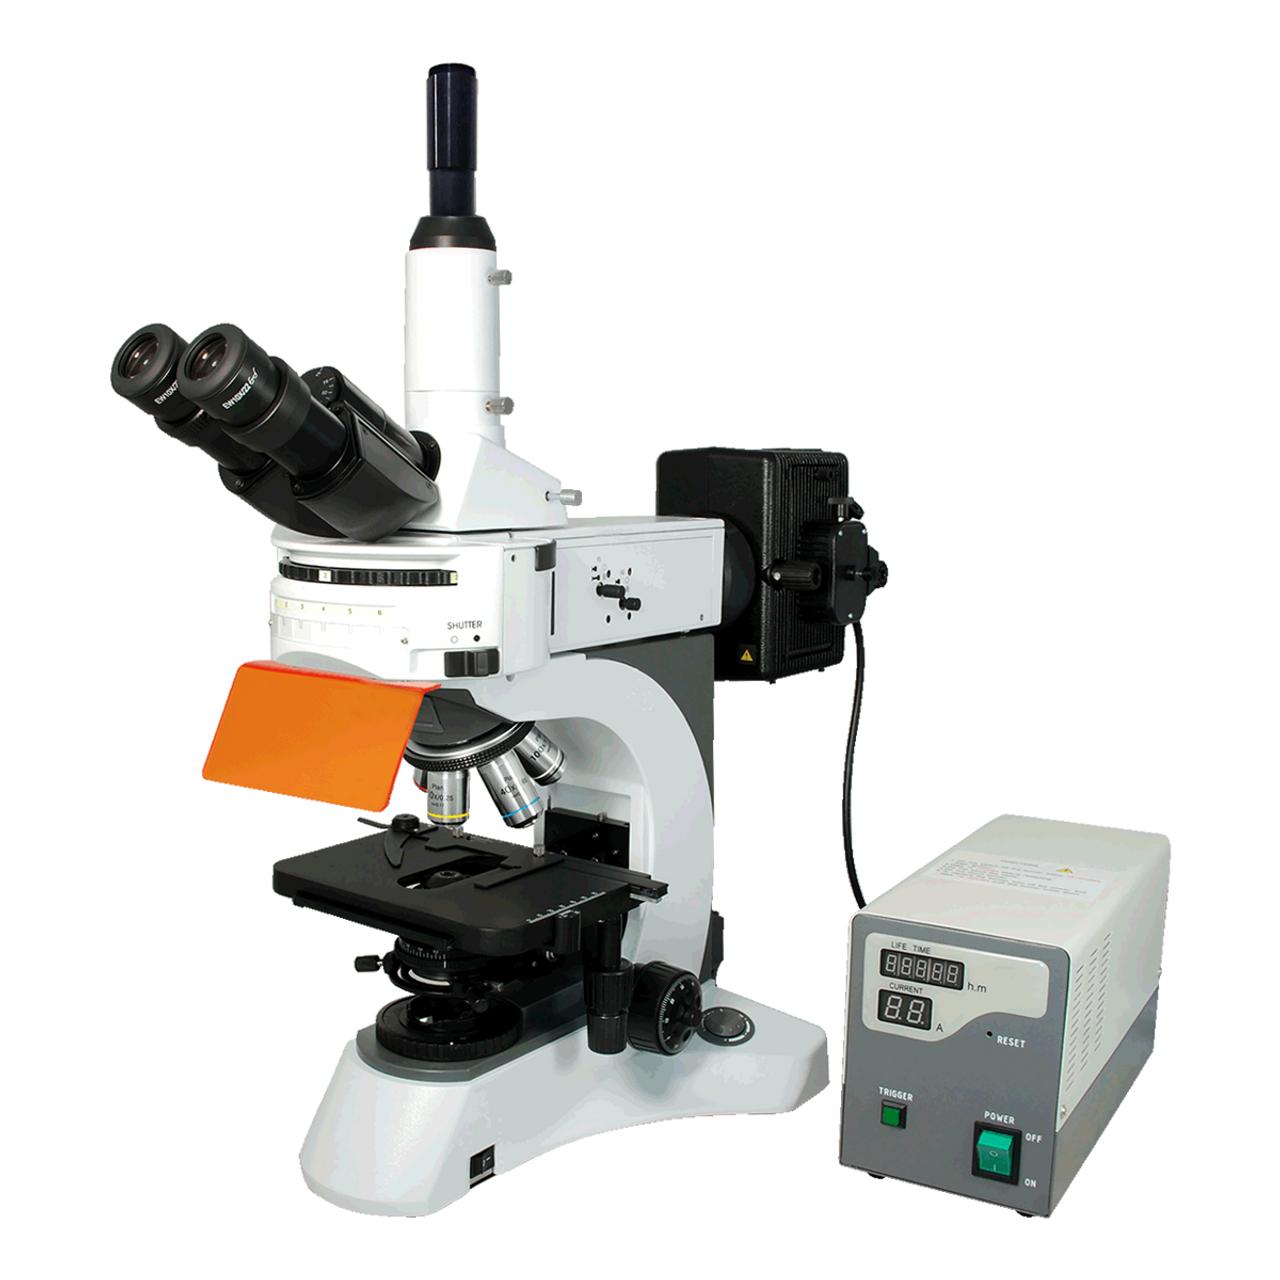 BoliOptics 4X Infinity-Corrected Plan Achromatic Microscope Objective Lens BM13013231